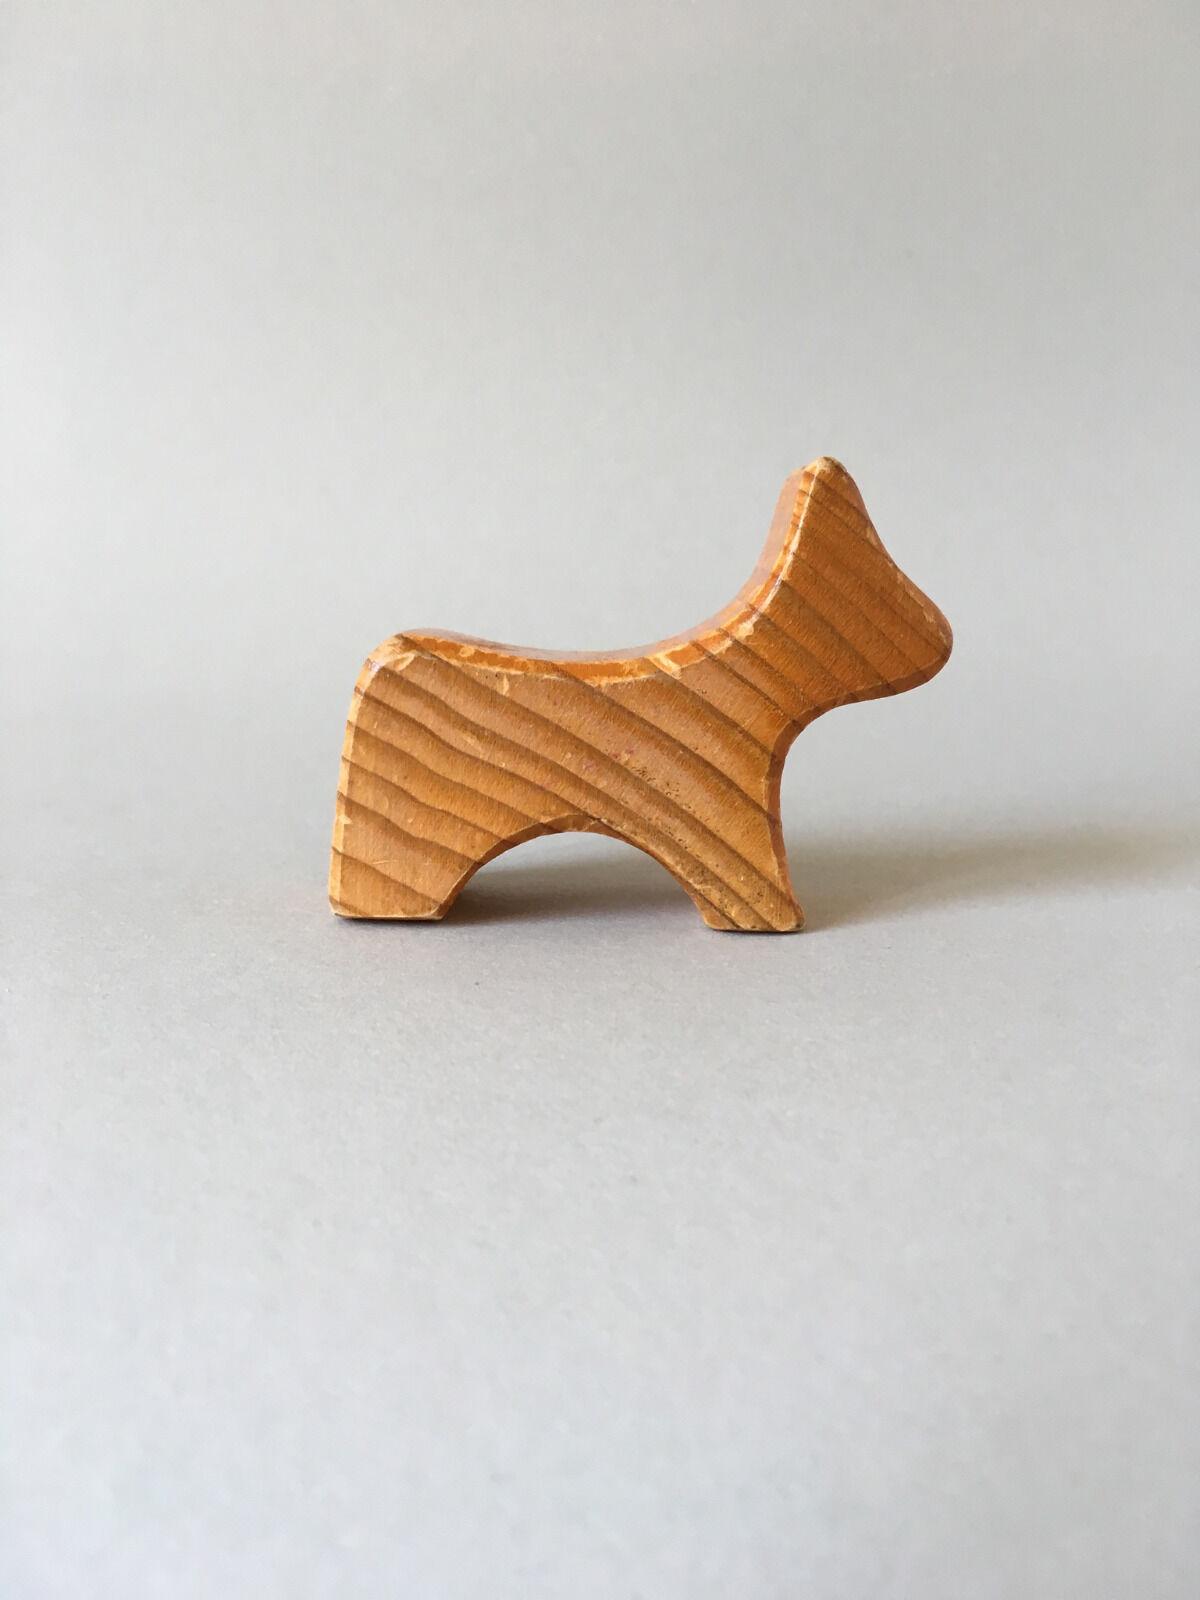 Antonio Vitali wooden Animal Juguete little Dog - Vintage Swiss Design - Very rare